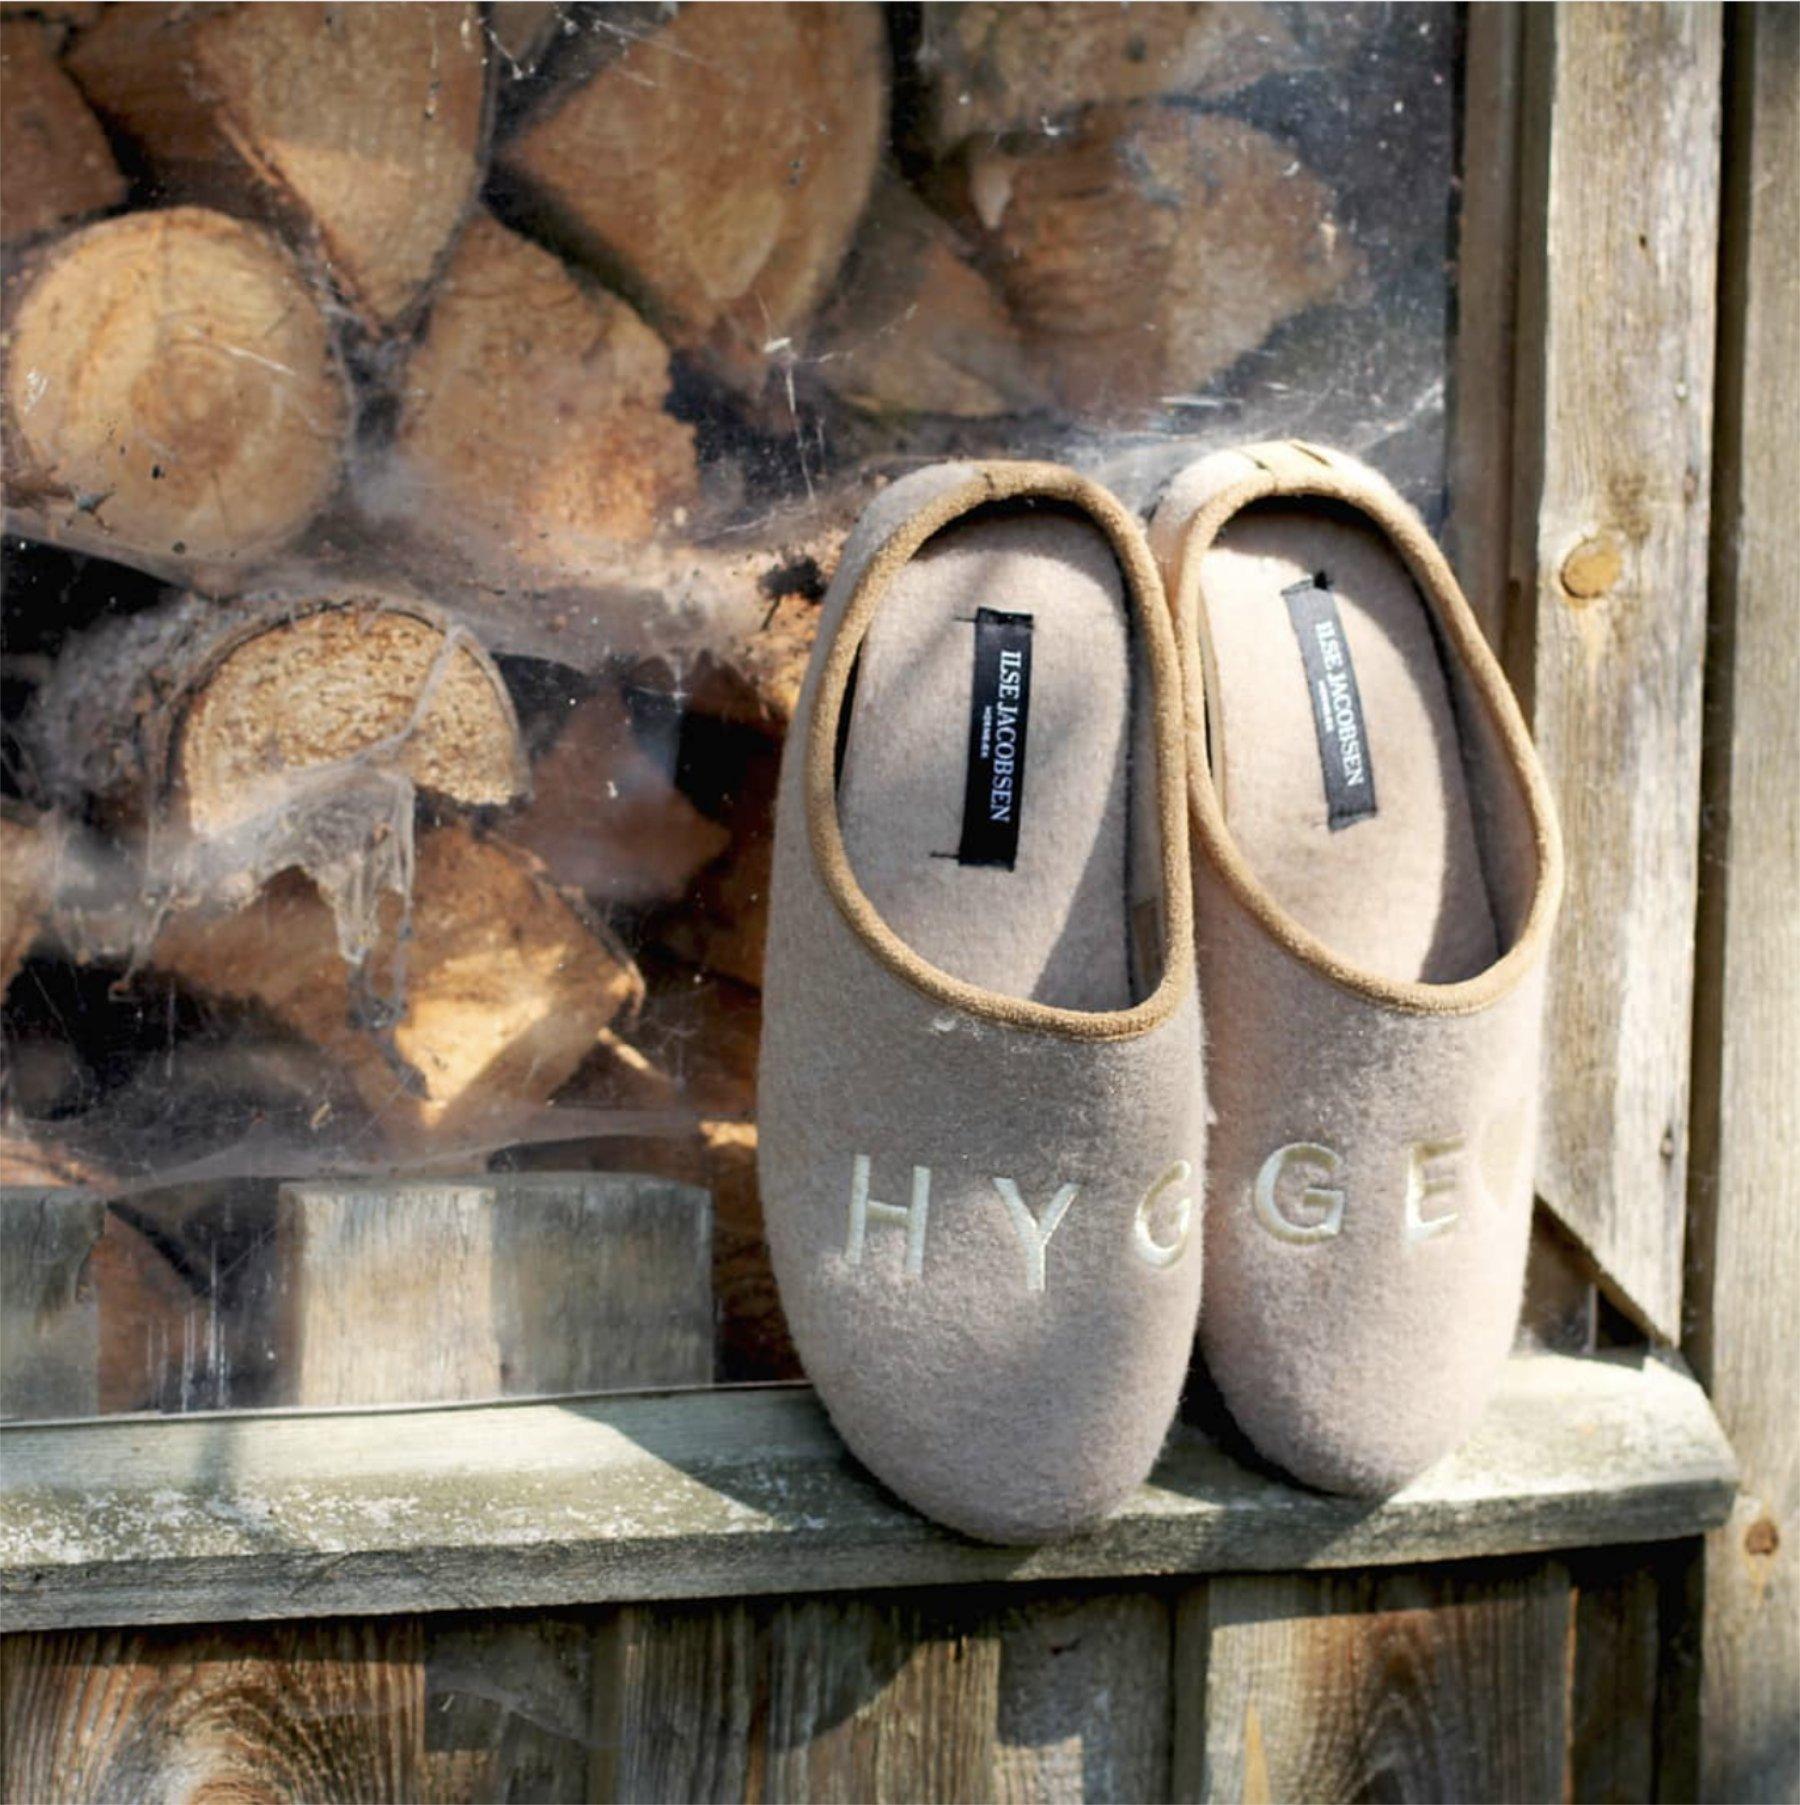 ThatScandinavianFeeling slippers hygge cozy gift guide